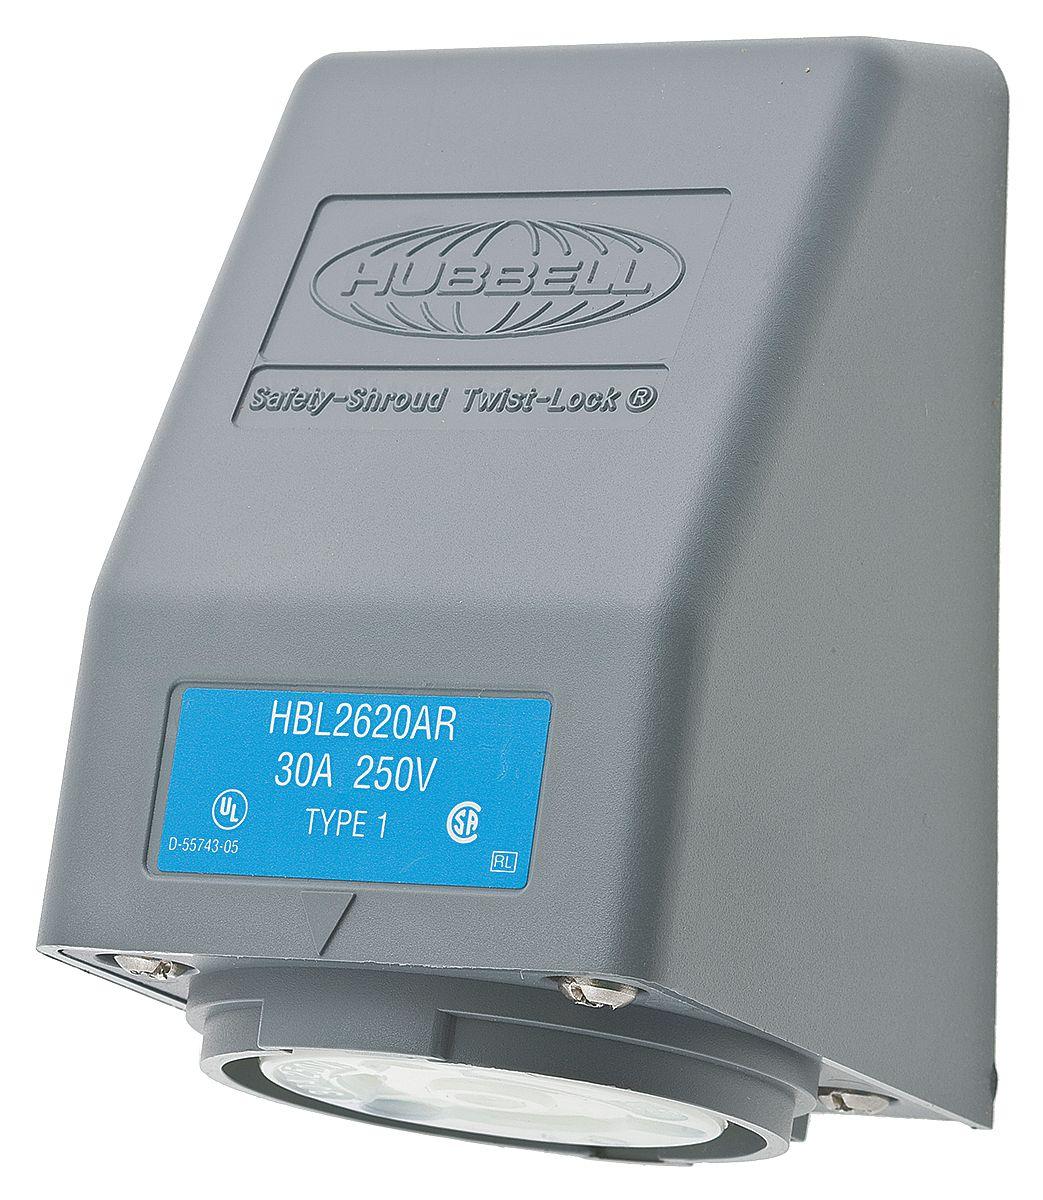 HBL2620AR - Hubbell Wiring Device-Kellems - datasheet